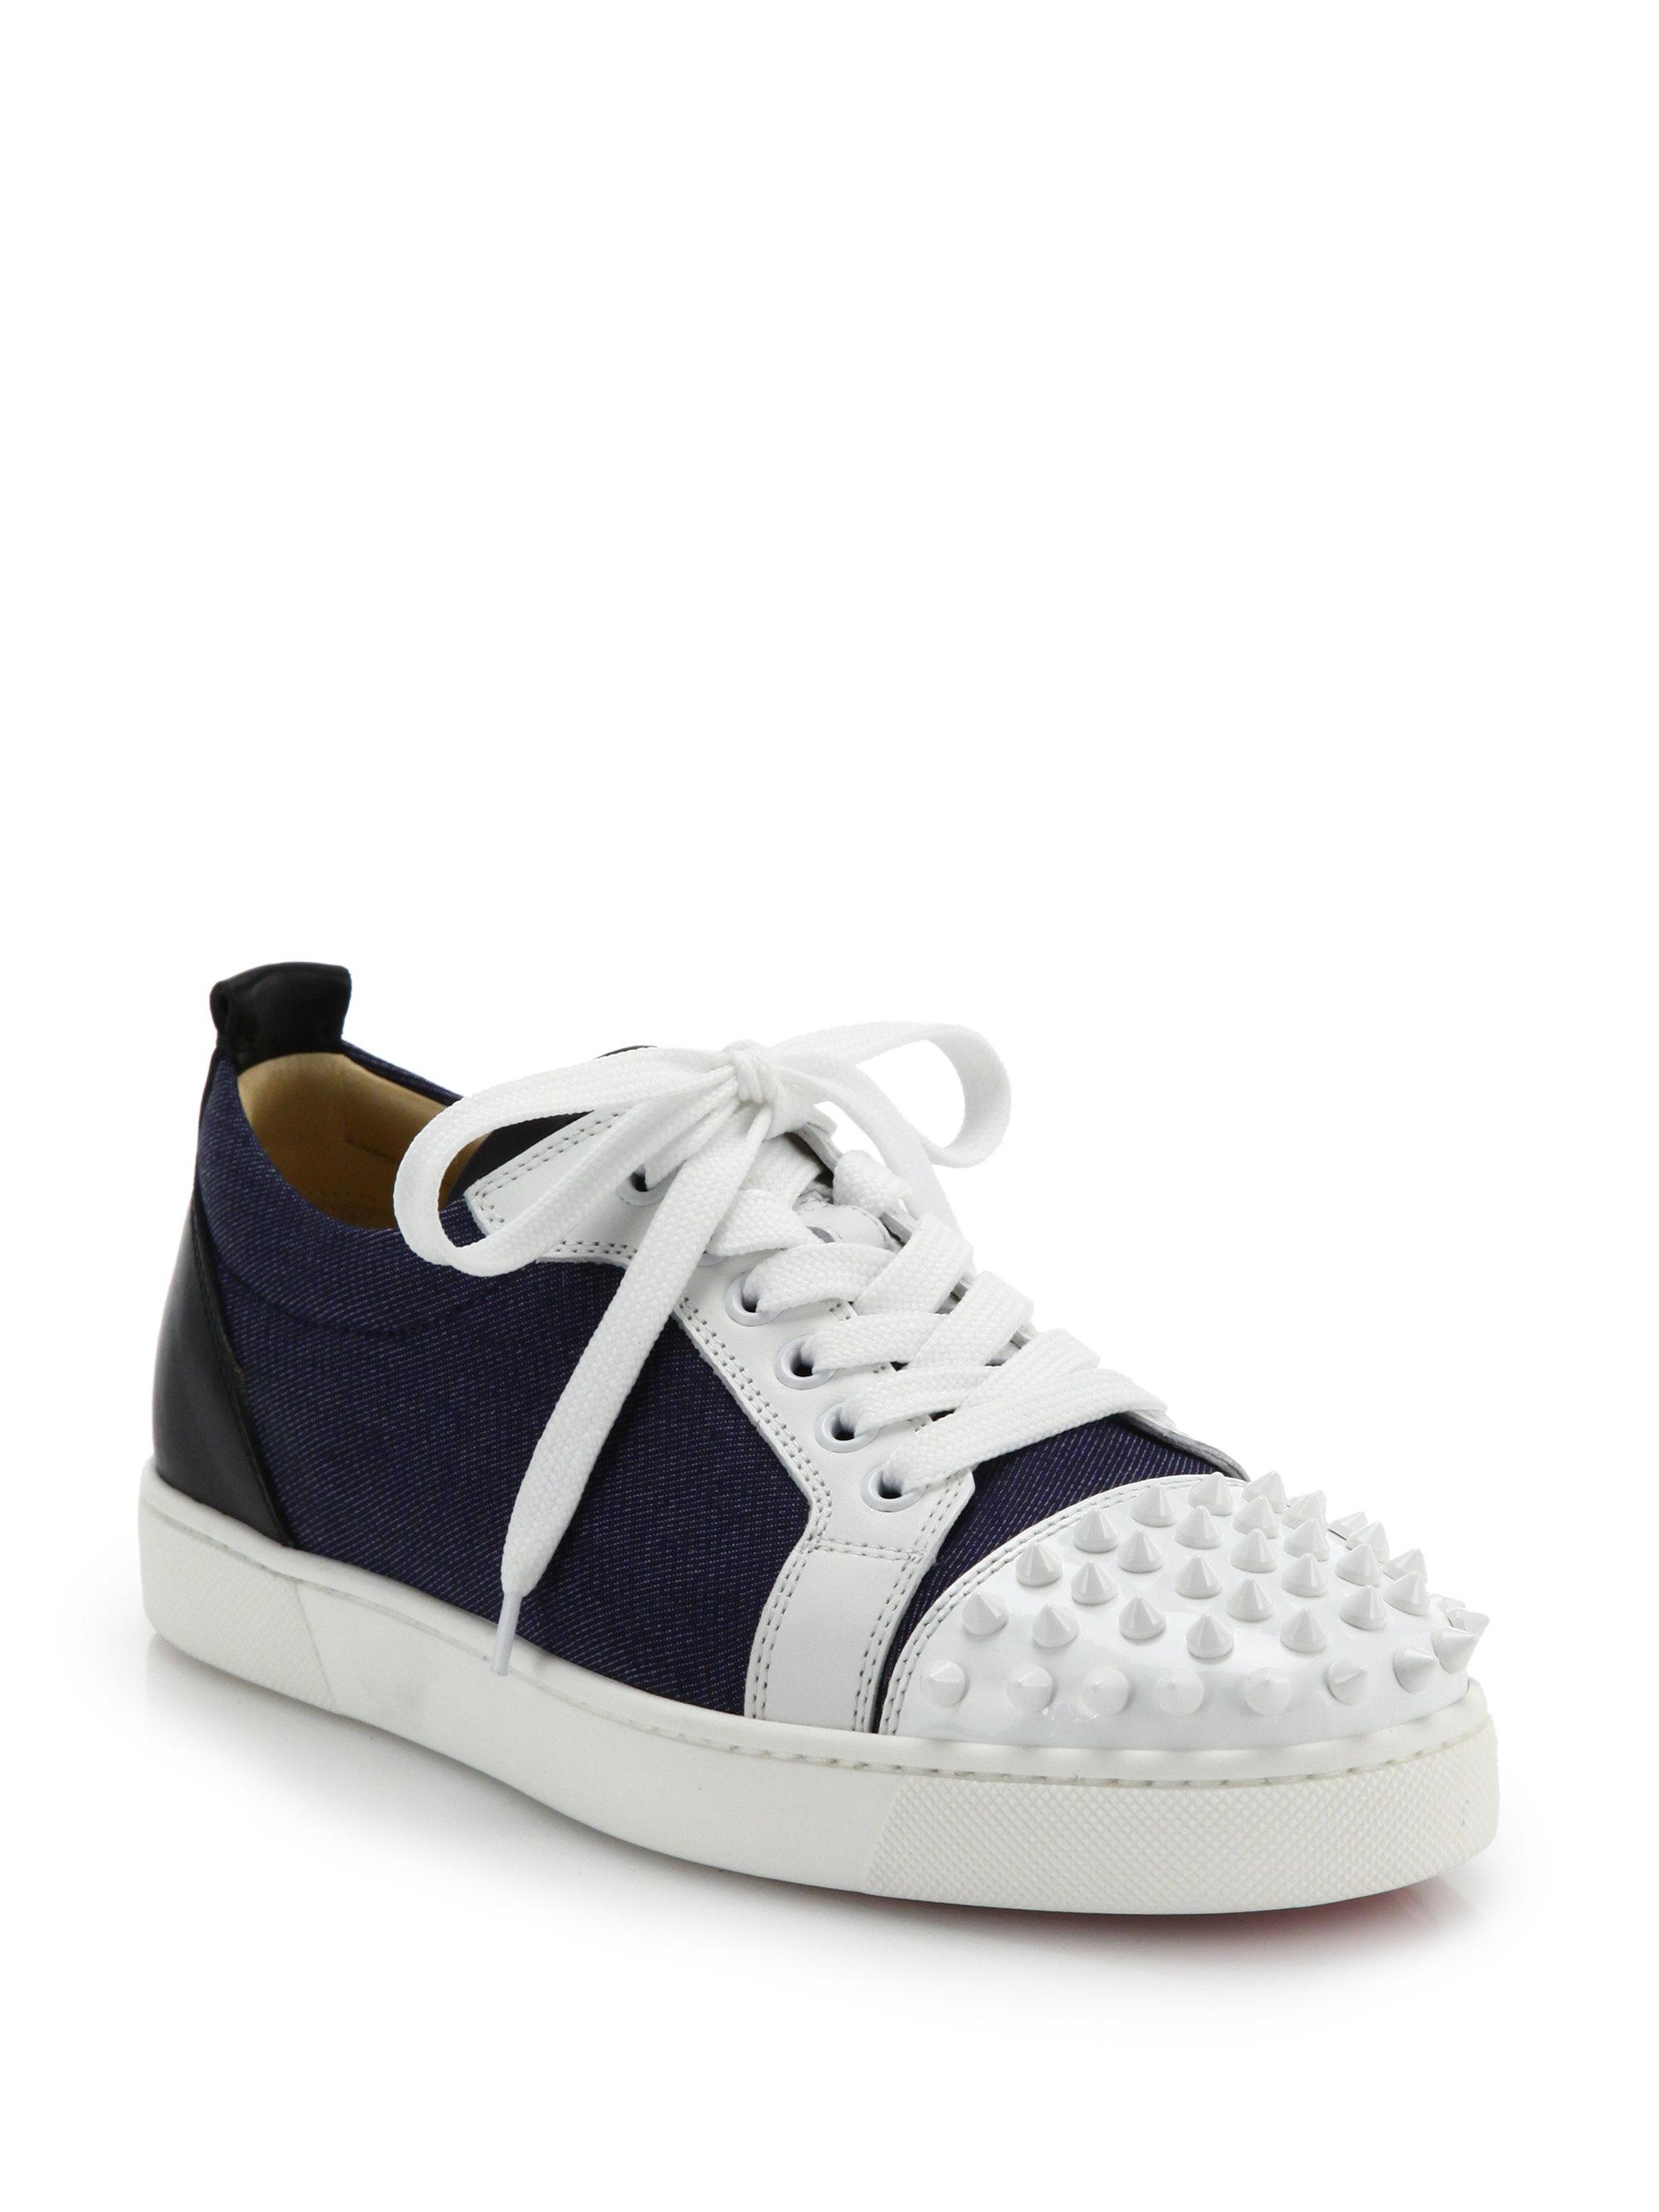 christian louboutin denim sneakers